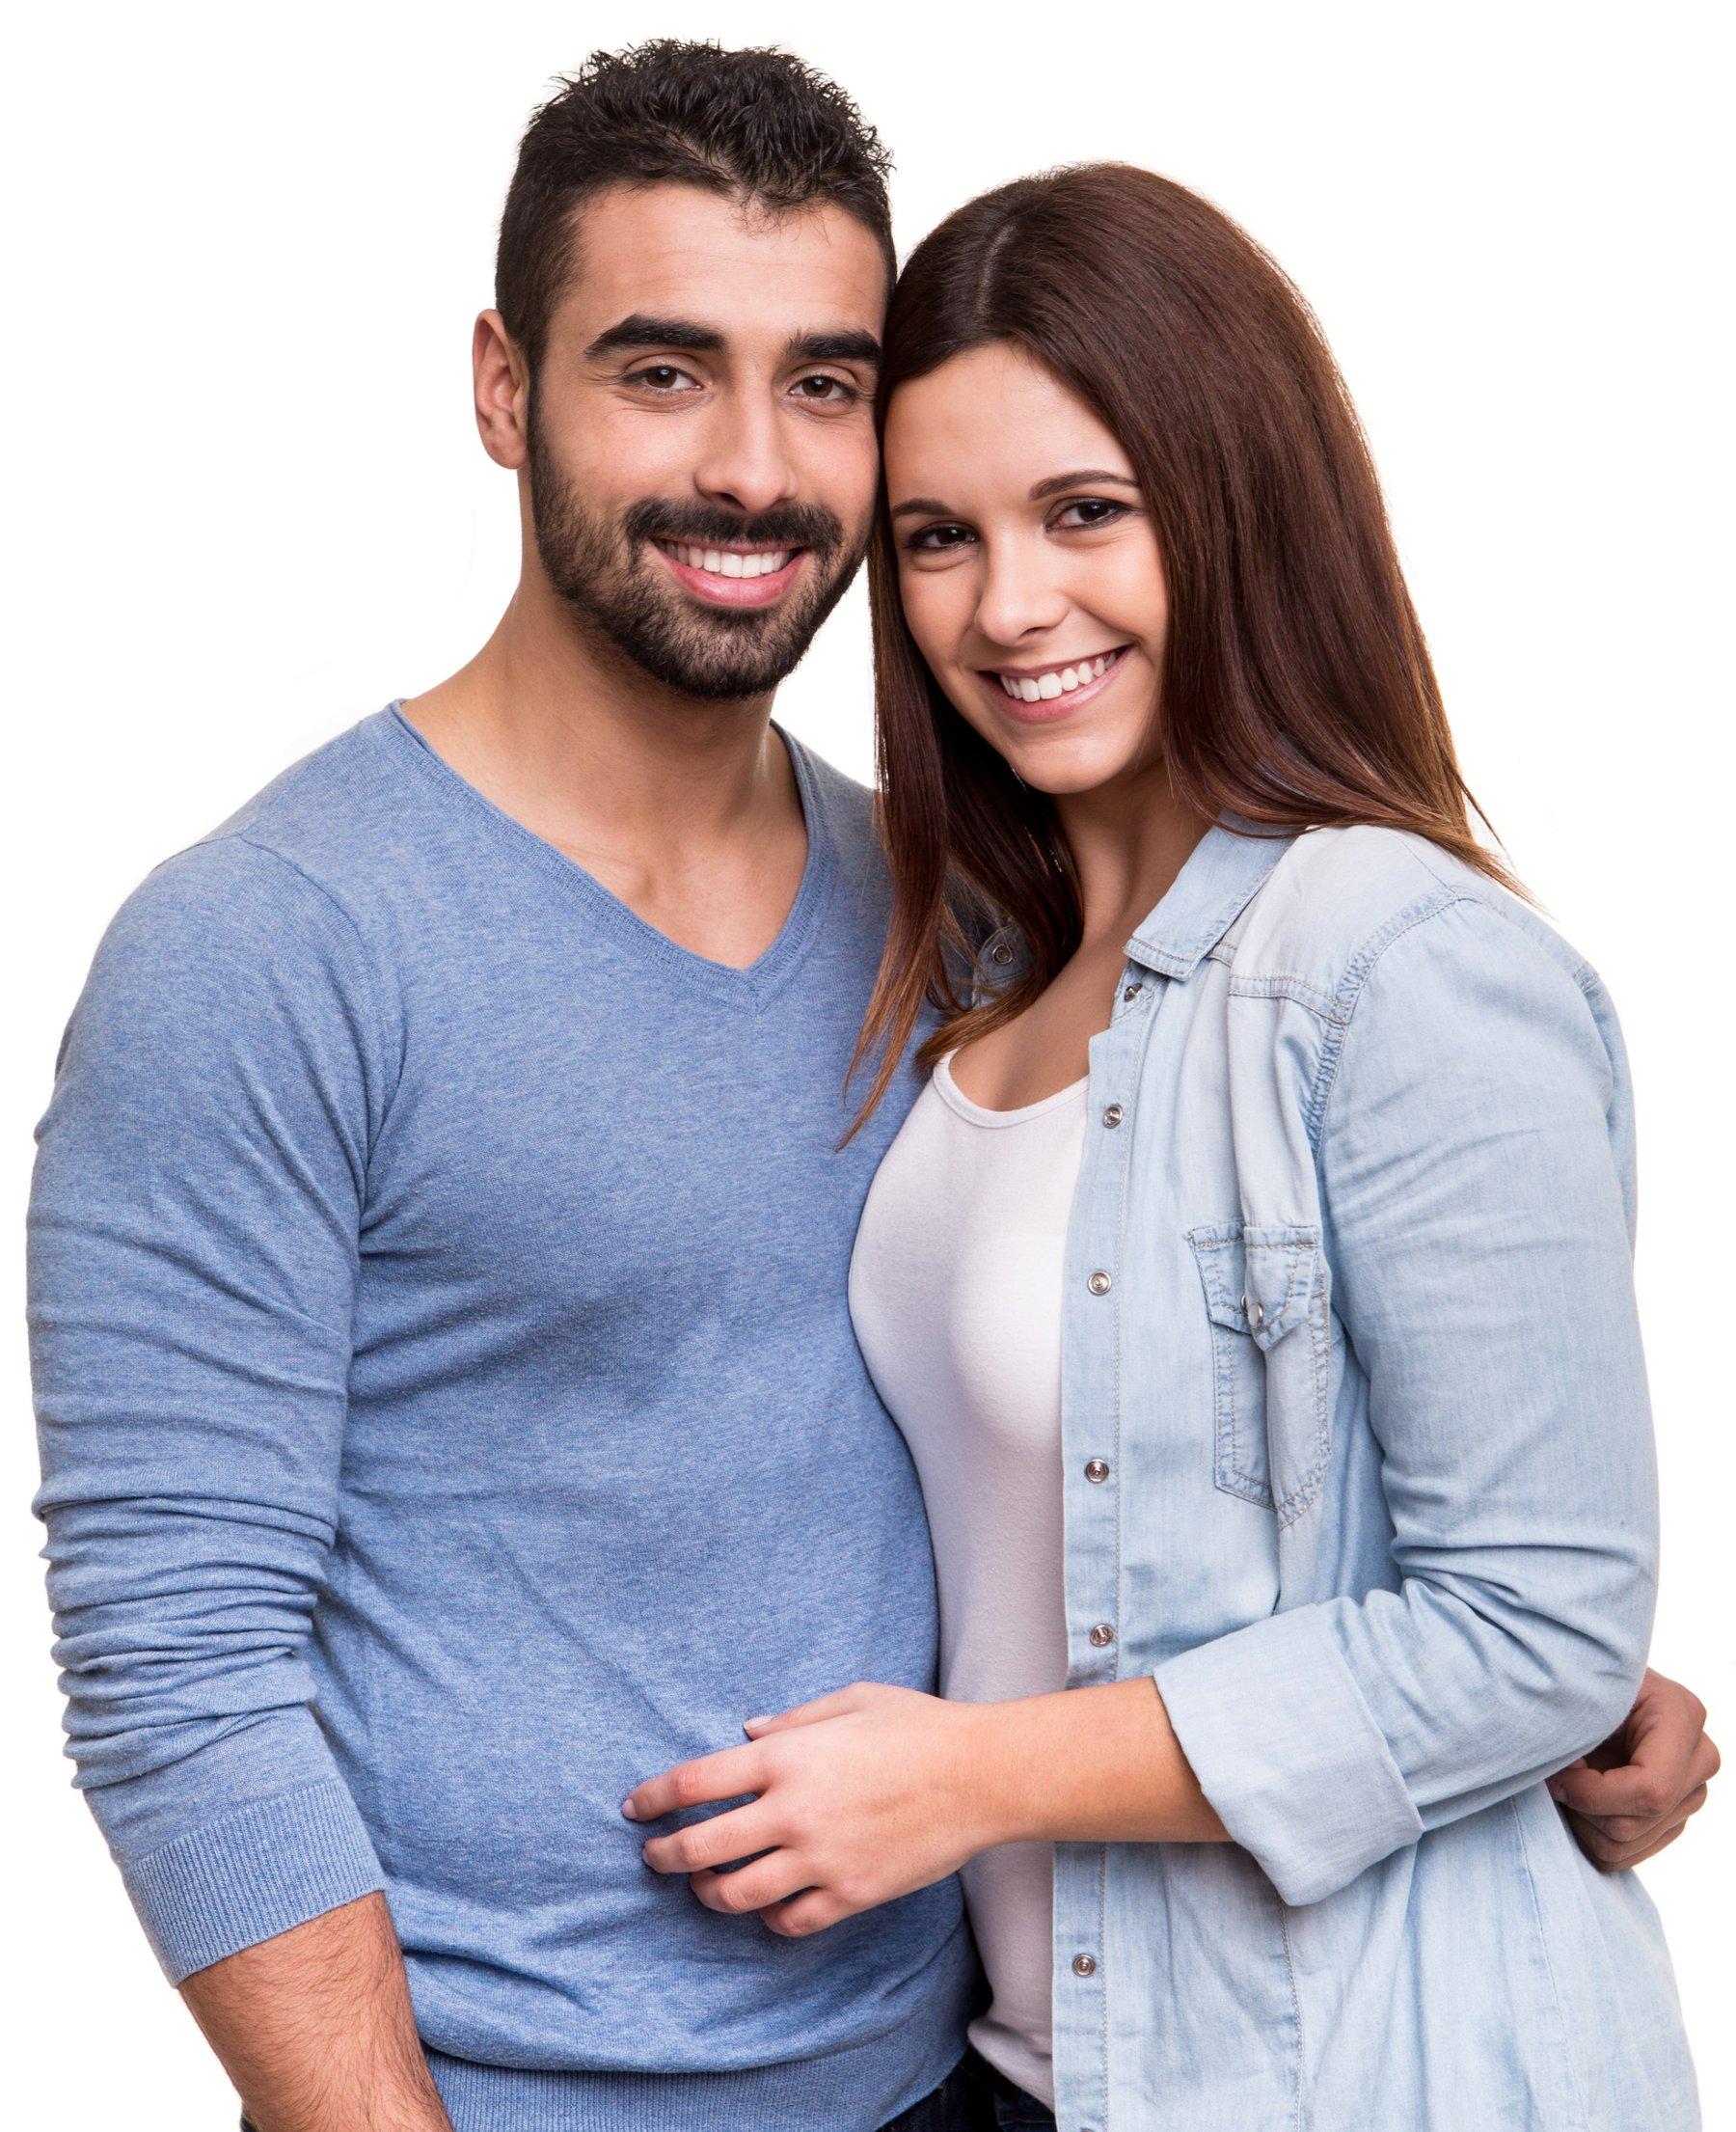 Low Testosterone & Low Libido- Cranston, RI | Natural Low